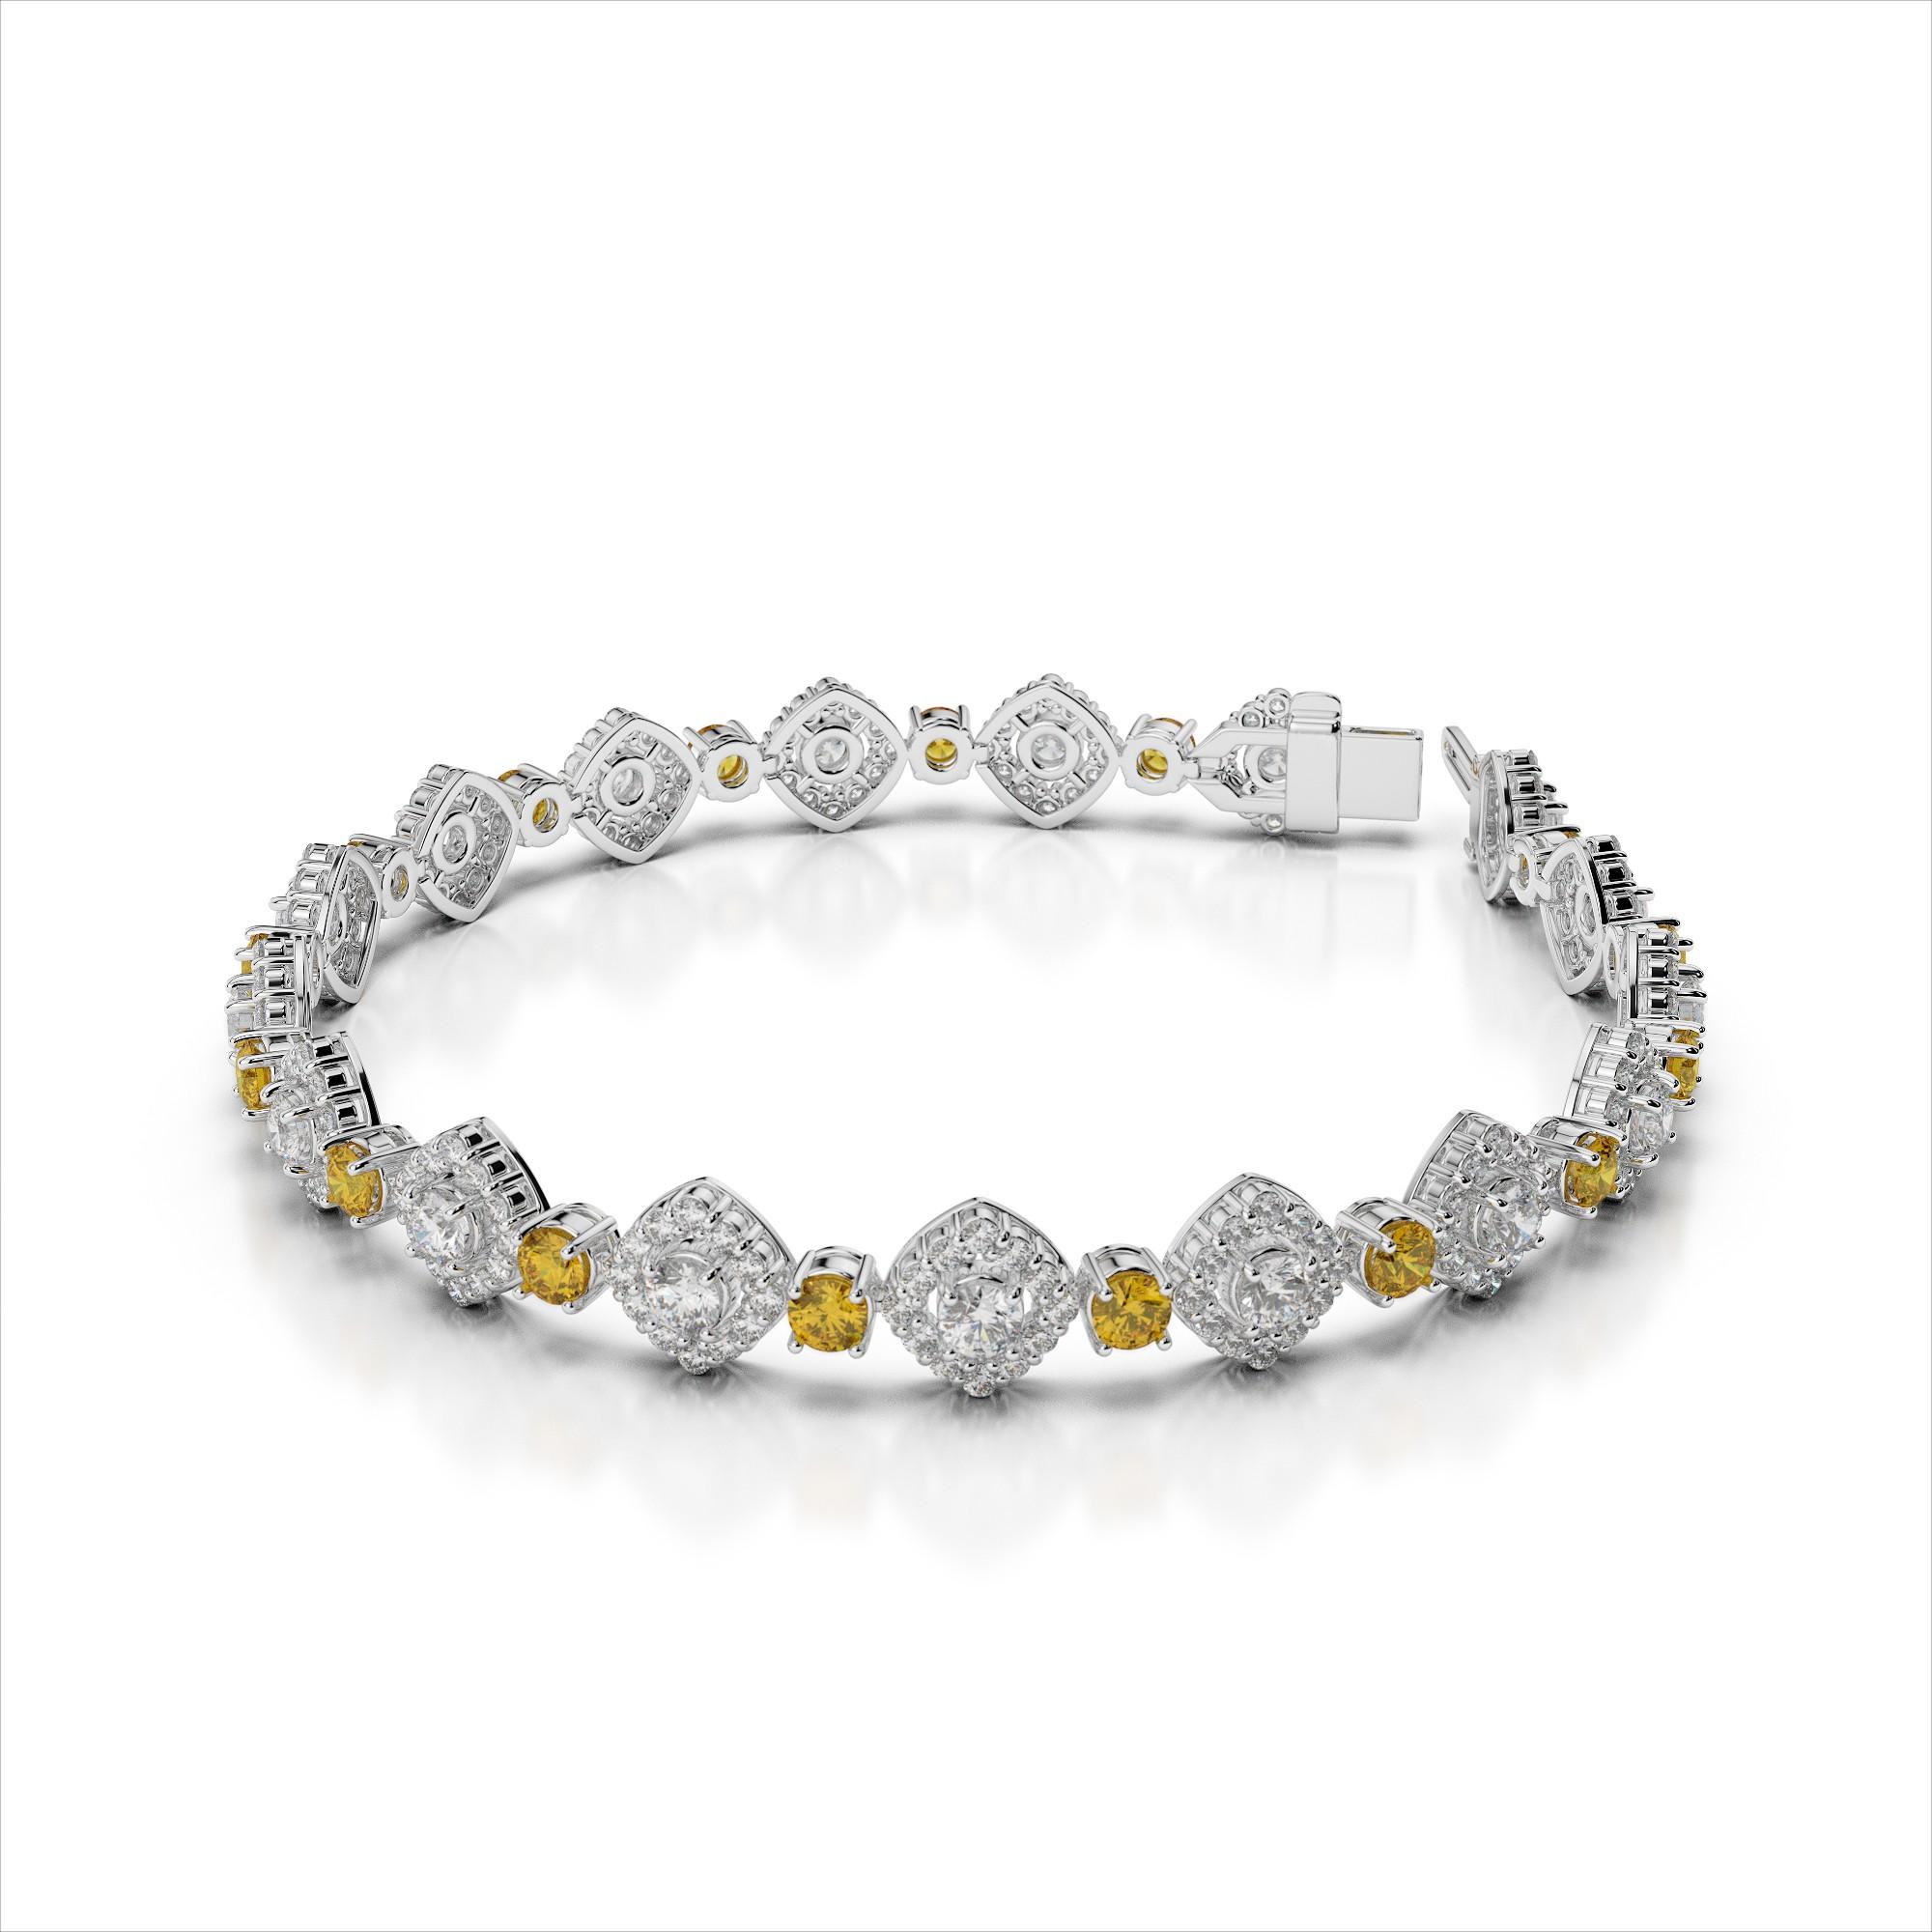 Diamond and Yellow Sapphire Link Bracelet